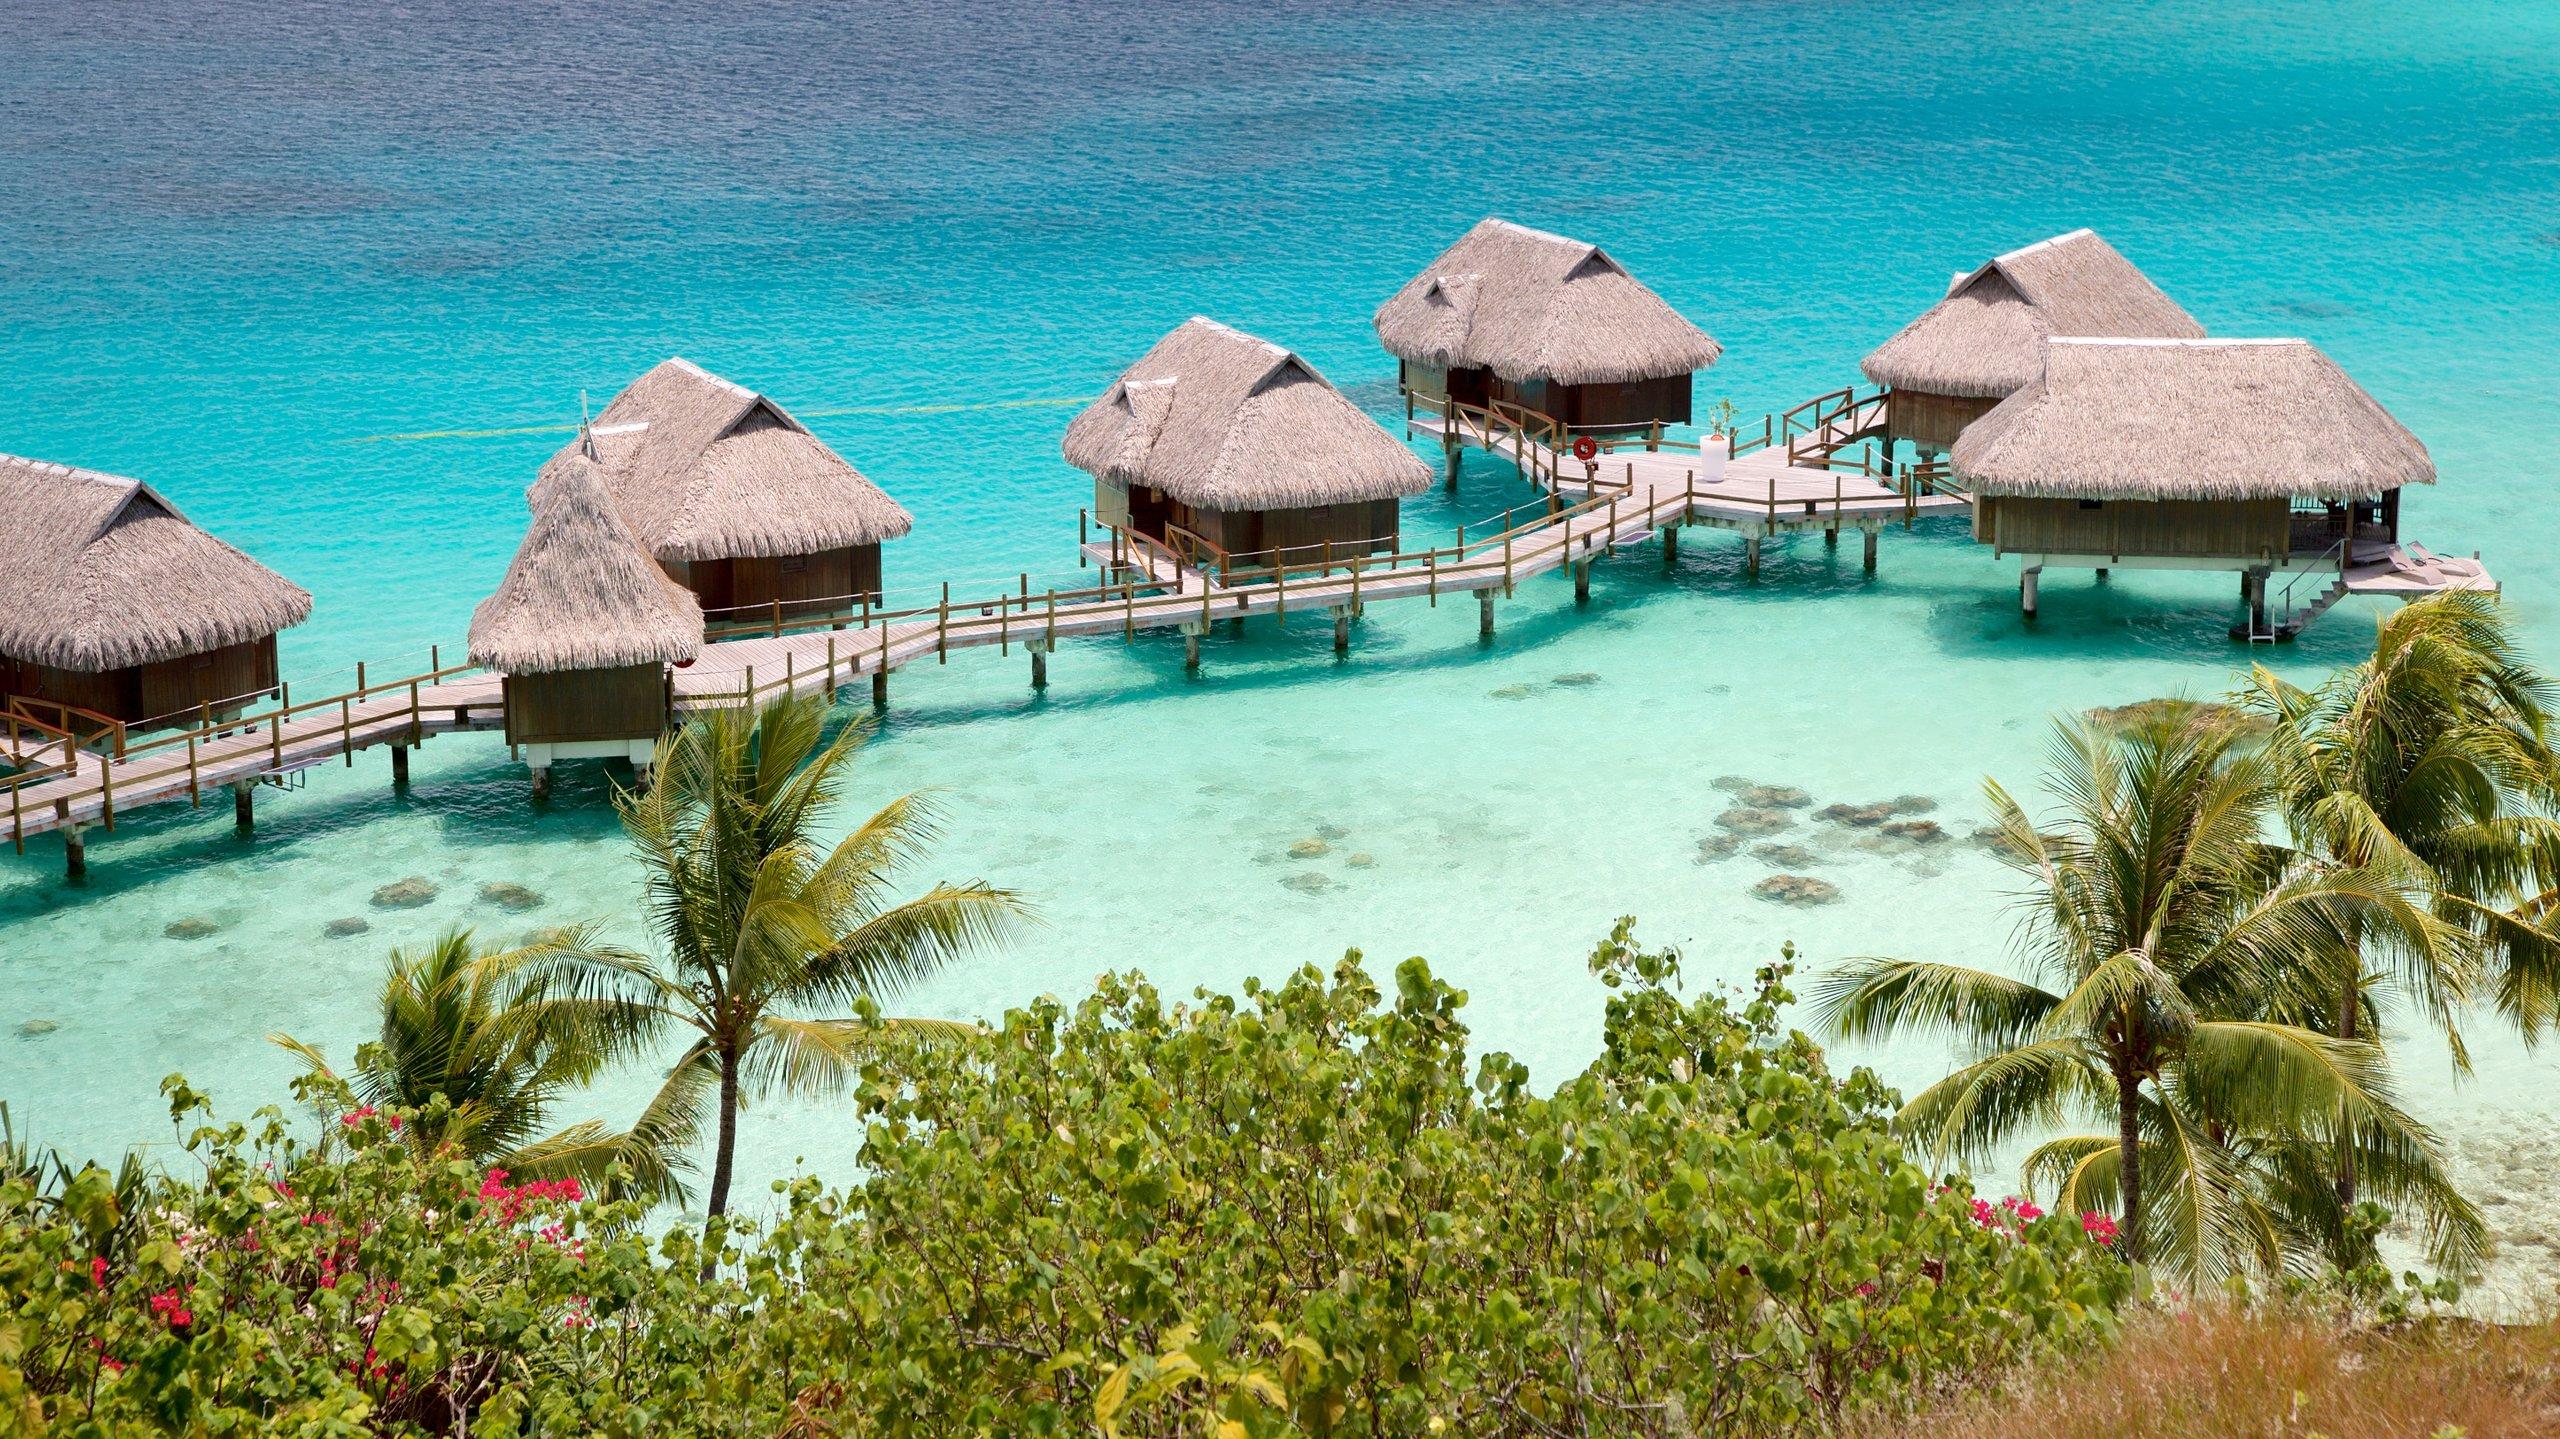 Top 10 Cheap Hotels in Bora Bora  Expedia